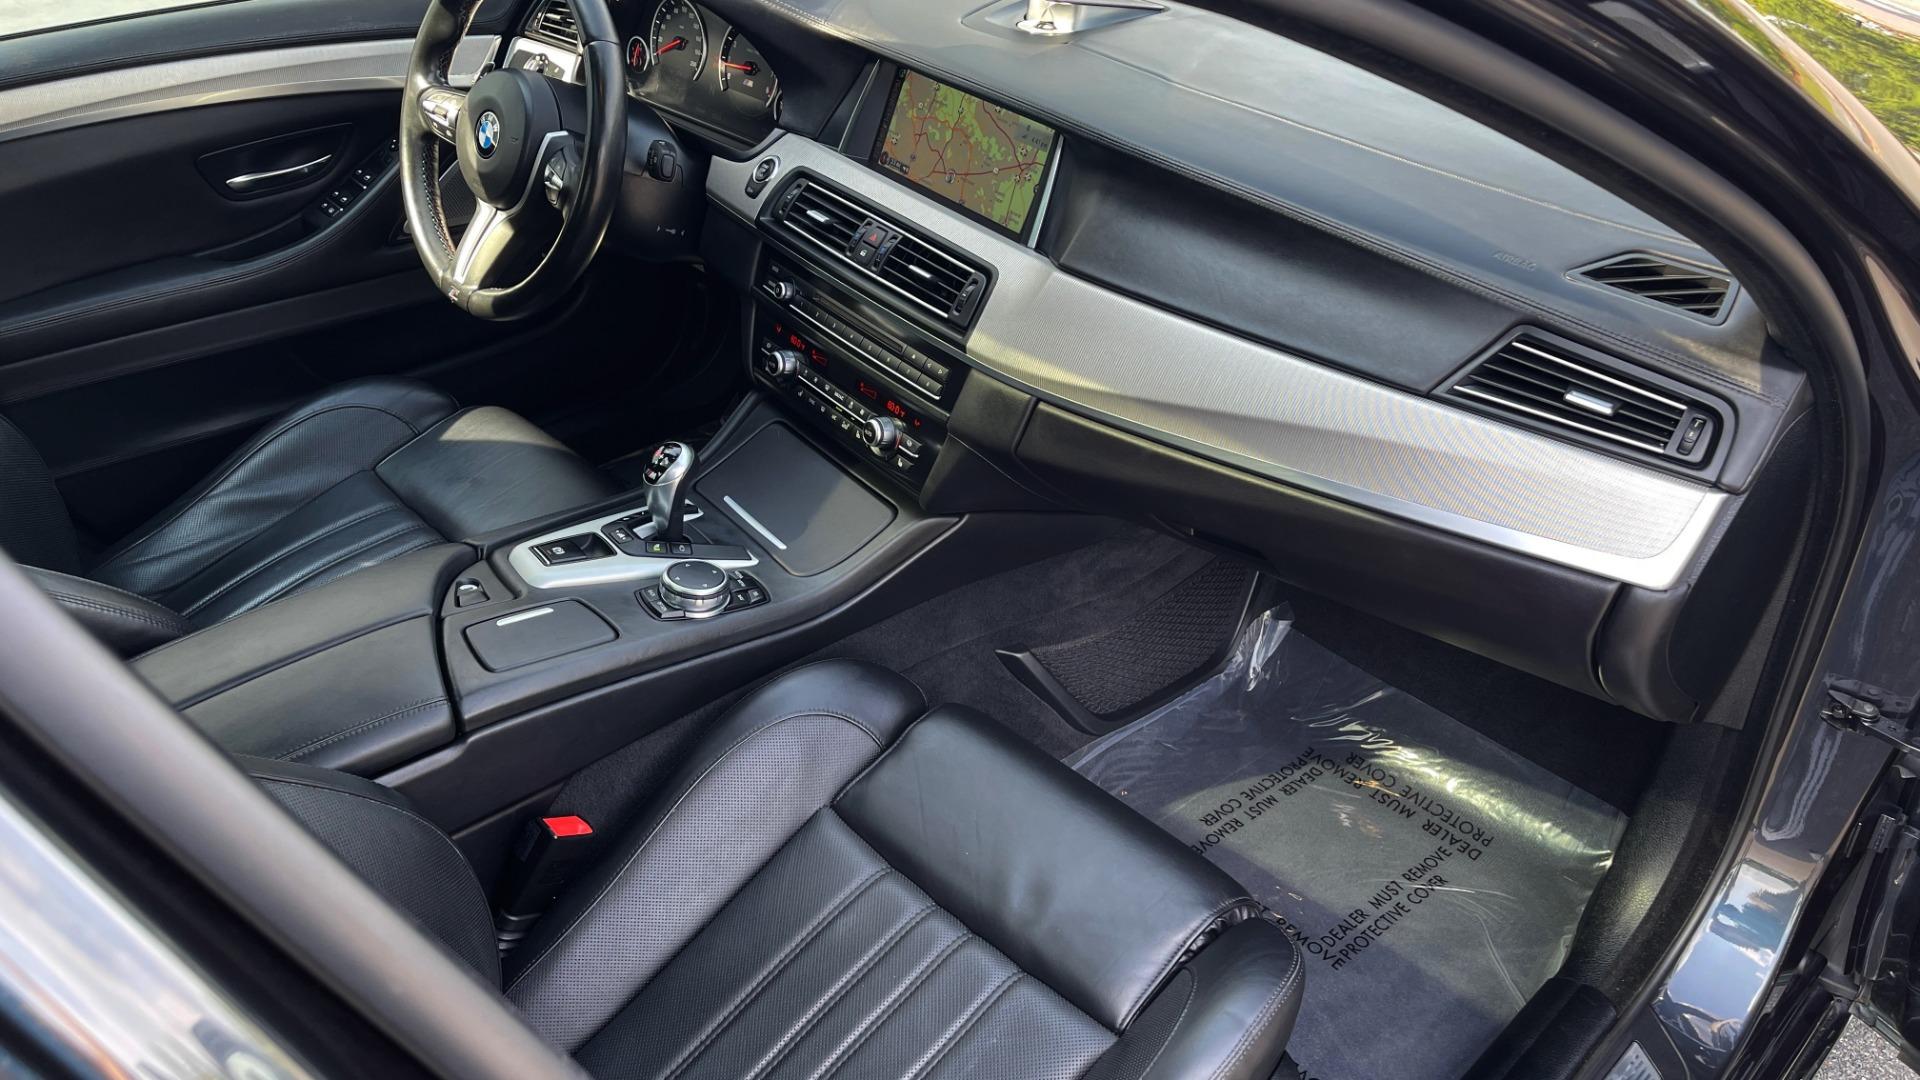 Used 2015 BMW M5 SEDAN / EXEC PKG / HUD / NAV / B&O SND / SUNROOF / REARVIEW for sale Sold at Formula Imports in Charlotte NC 28227 93